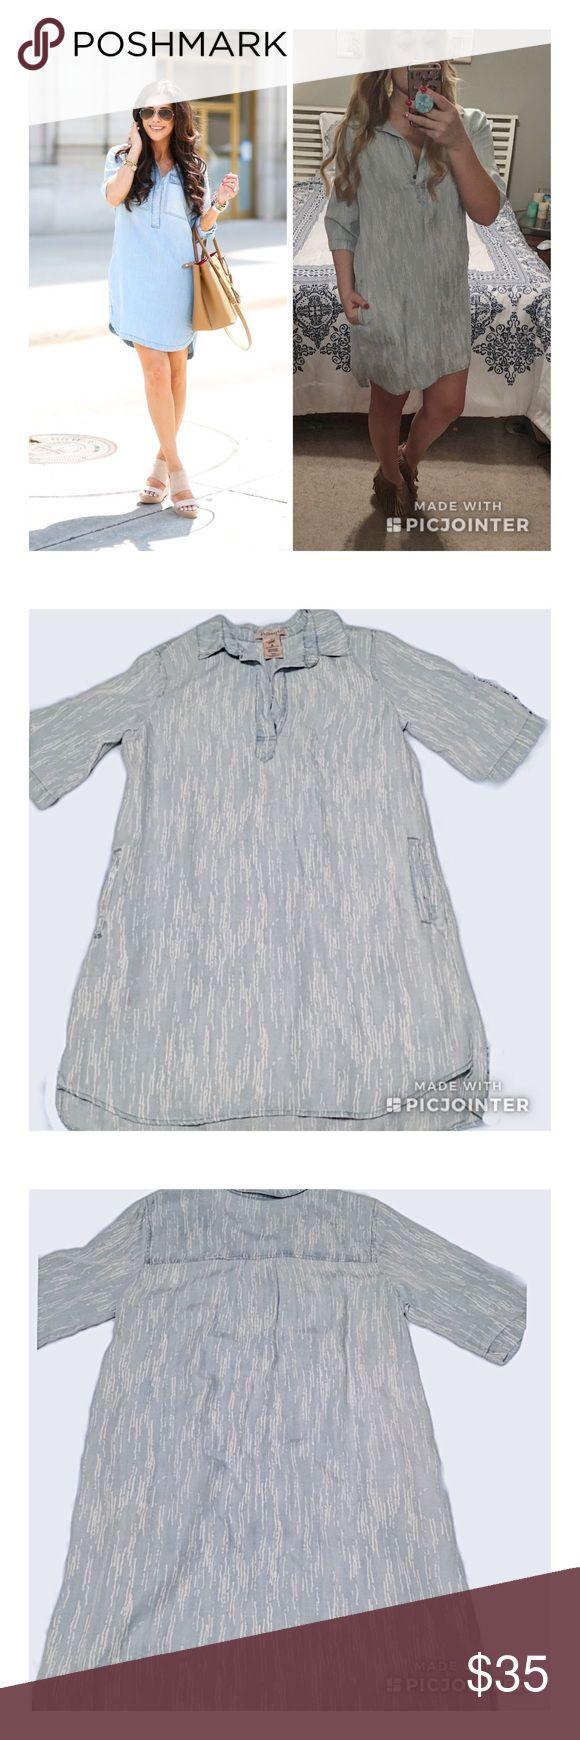 Philosophy meteor stripe chambray shirt dress Super cute chambray shirt dress by philosophy! No flaws, measurements pending. Philosophy Dresses Midi